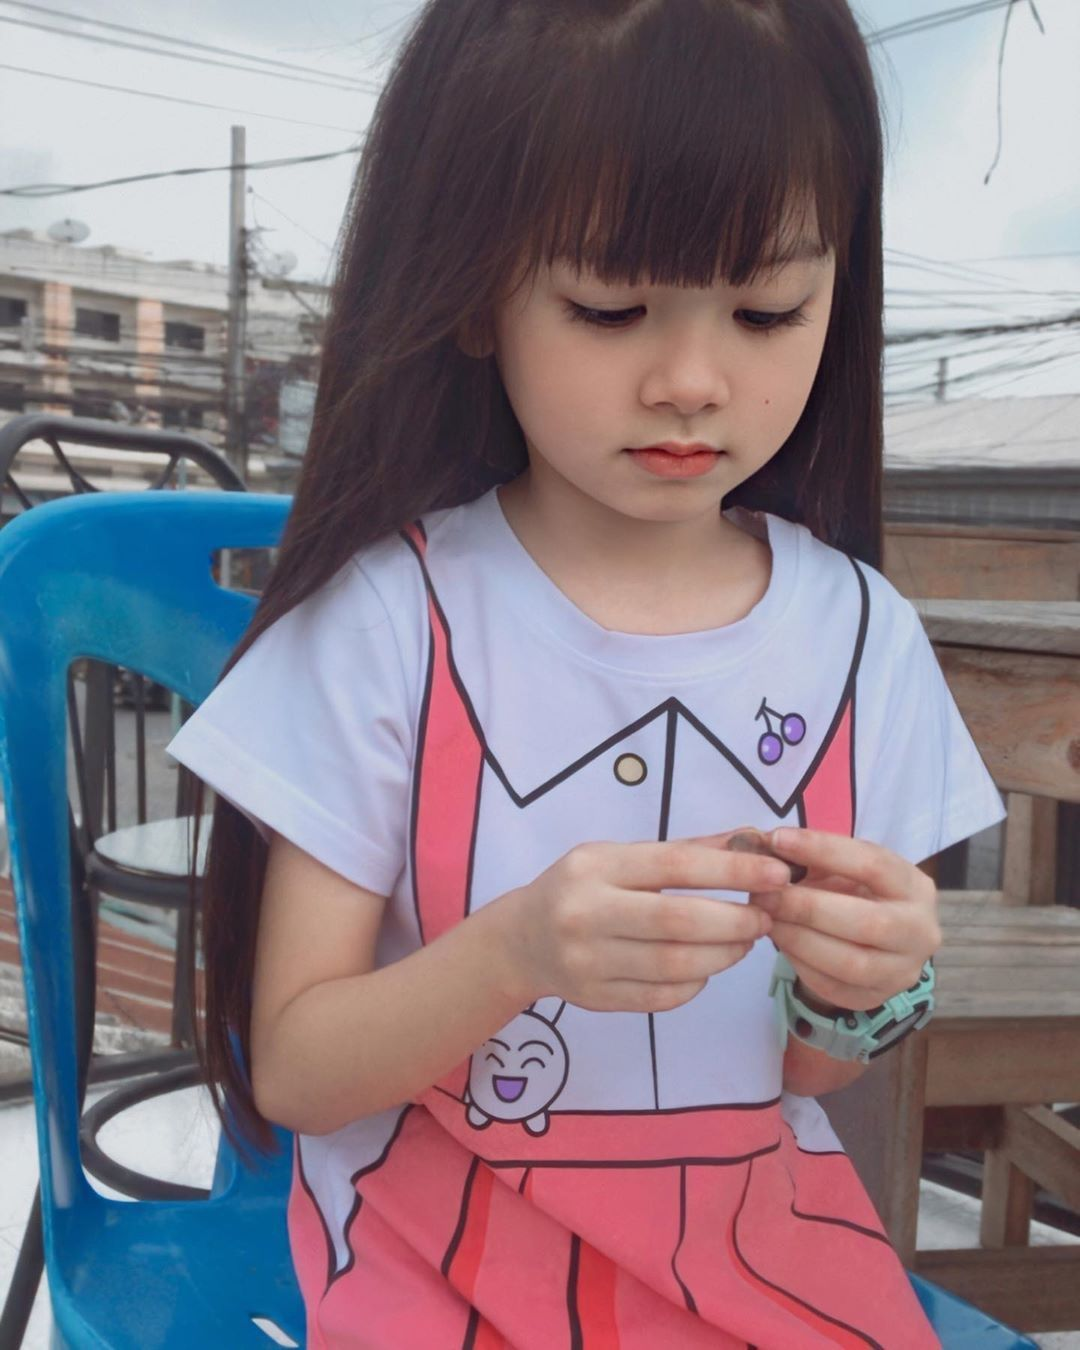 Pin Oleh Summy Di Ulzzang Kids Di 2020 Bayi Lucu Anak Bayi